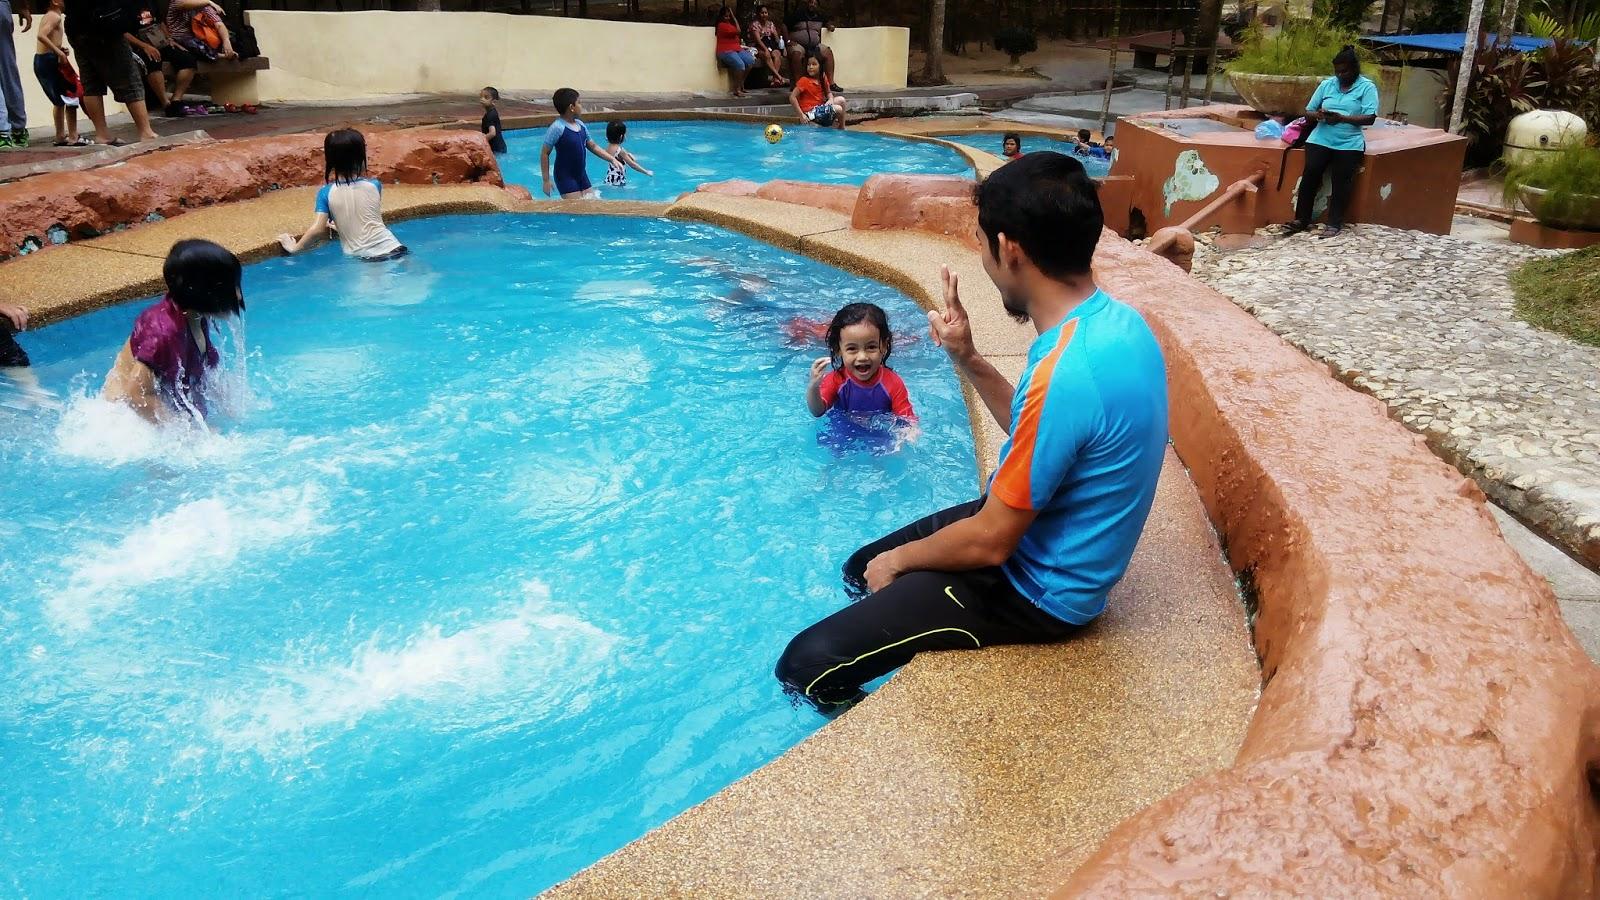 kolam air, kolam kanak-kanak, taman belia, pulau-pinang, kids, girl,